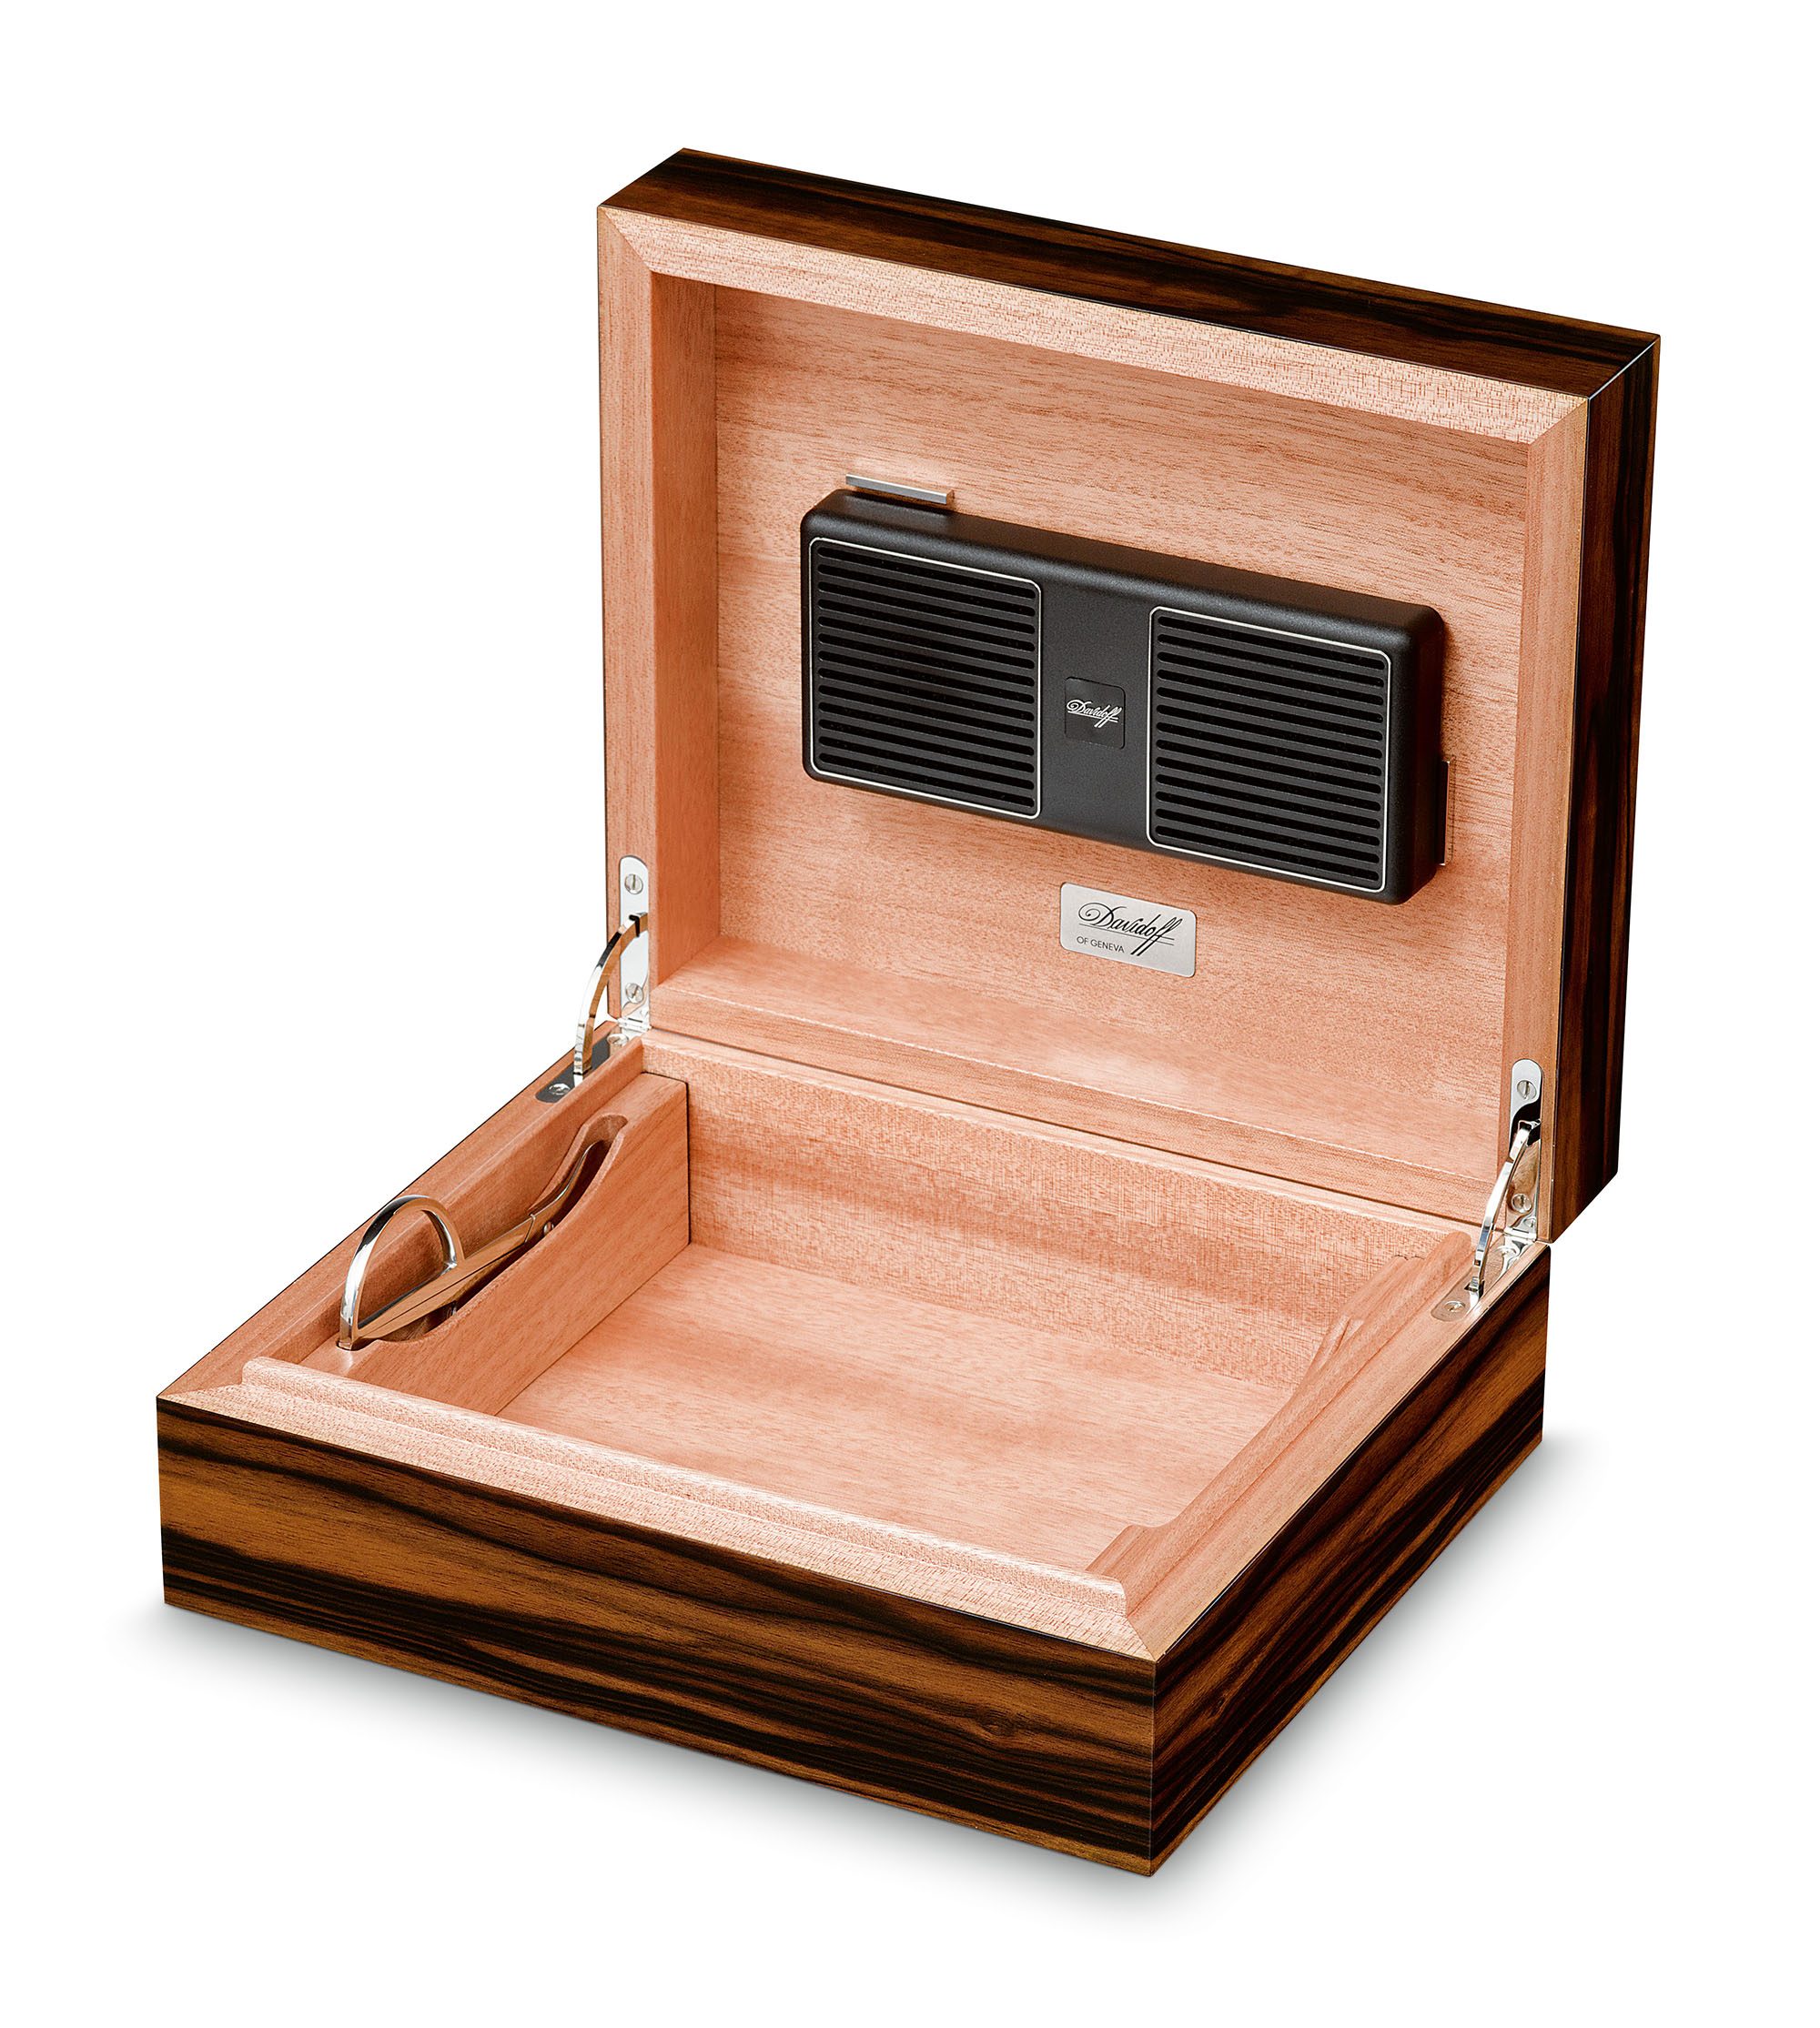 Primos Humidor Humidors Davidoff Cigar Accessories #783B16